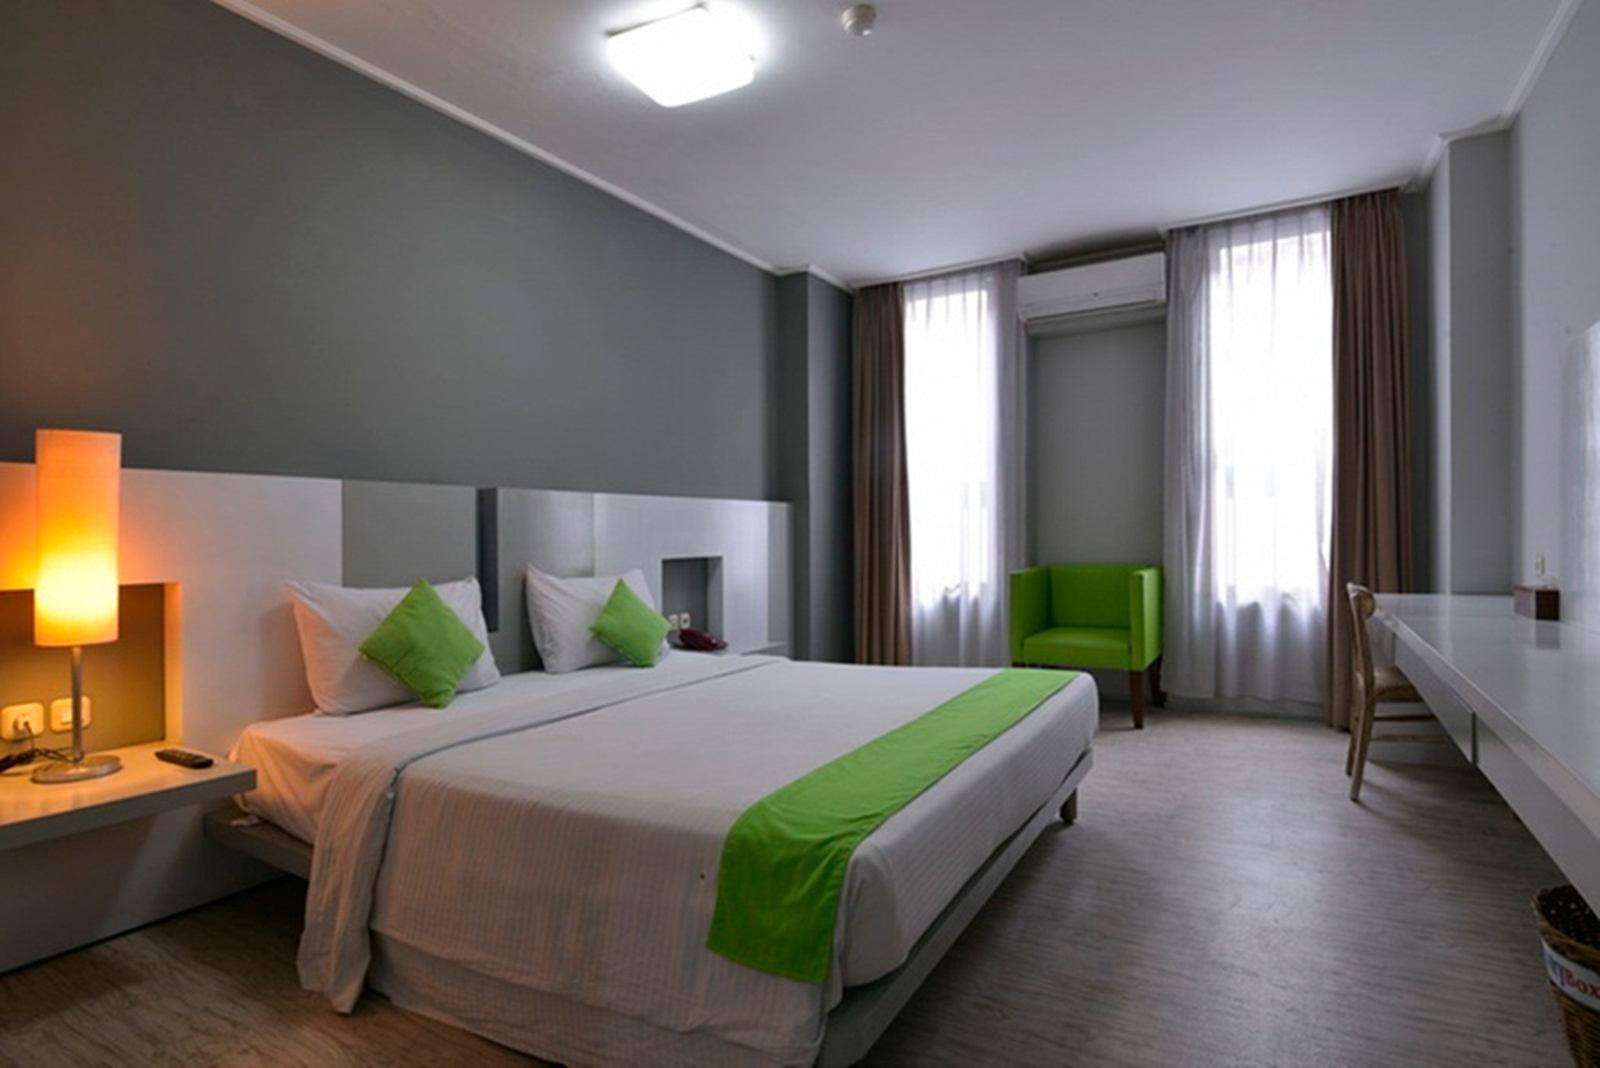 grand nanggroe hotel in aceh room deals photos reviews rh agoda com hotel grand nanggroe di aceh no telepon hotel grand nanggroe aceh